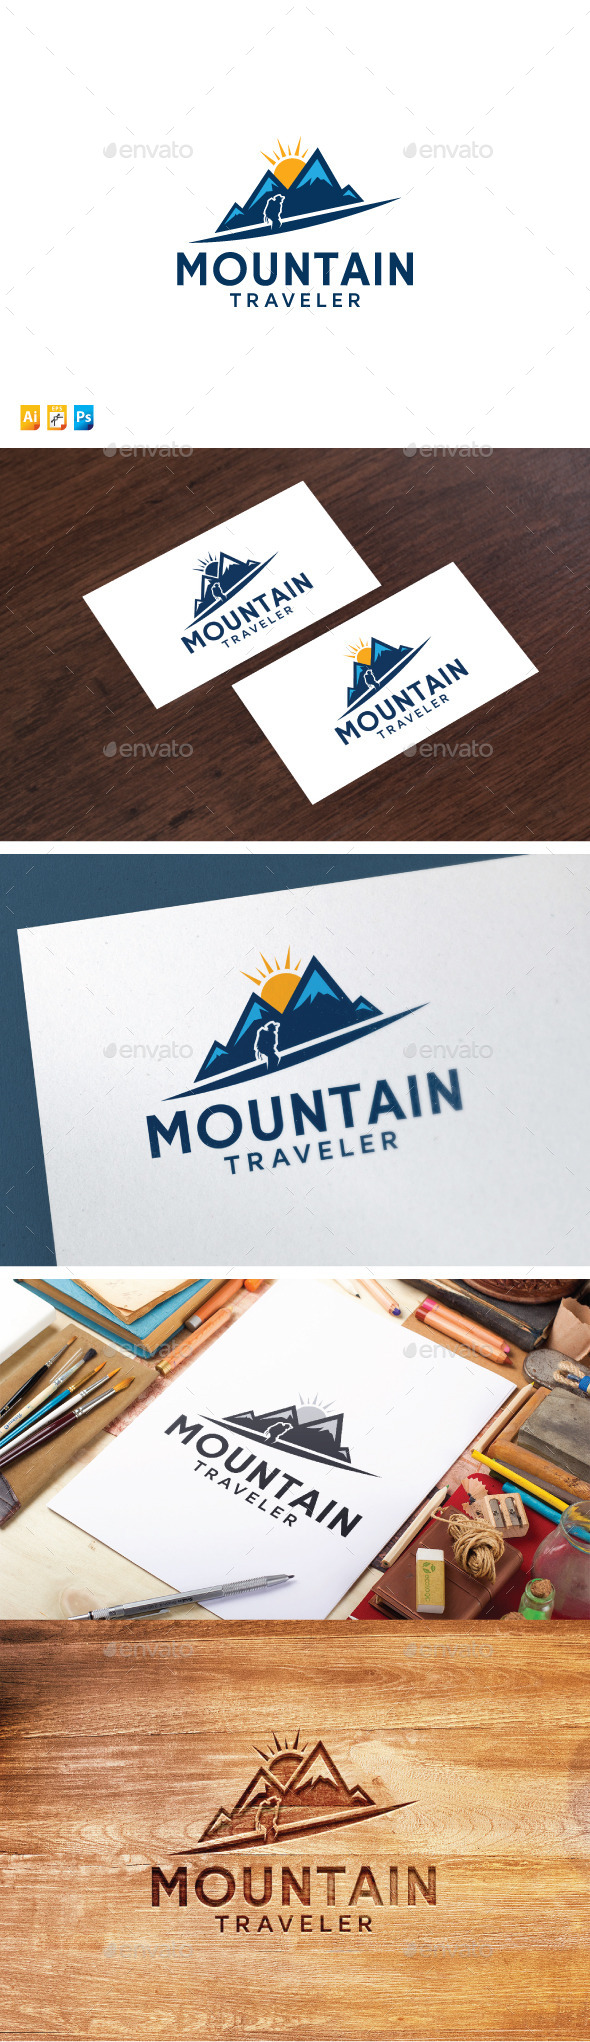 Mountain Traveler - Nature Logo Templates